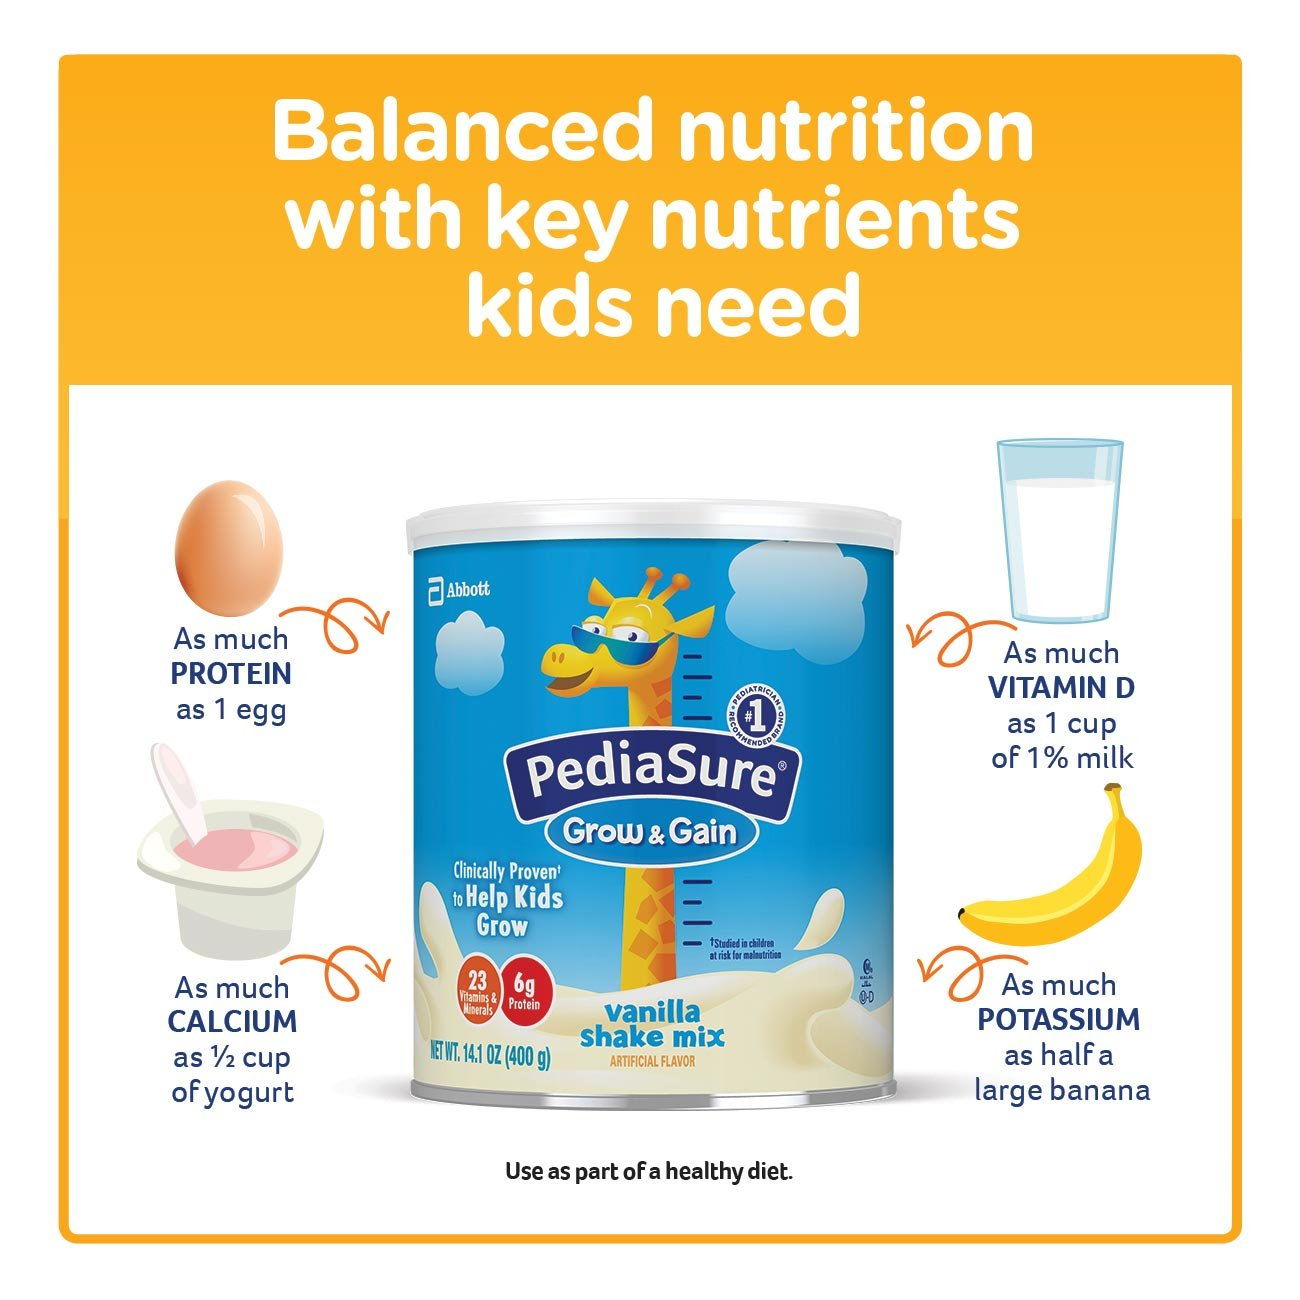 PediaSure Grow & Gain Non-GMO Vanilla Shake Mix Powder, Nutrition Shake for Kids, 14.1 oz, 3 Count by Pediasure (Image #6)